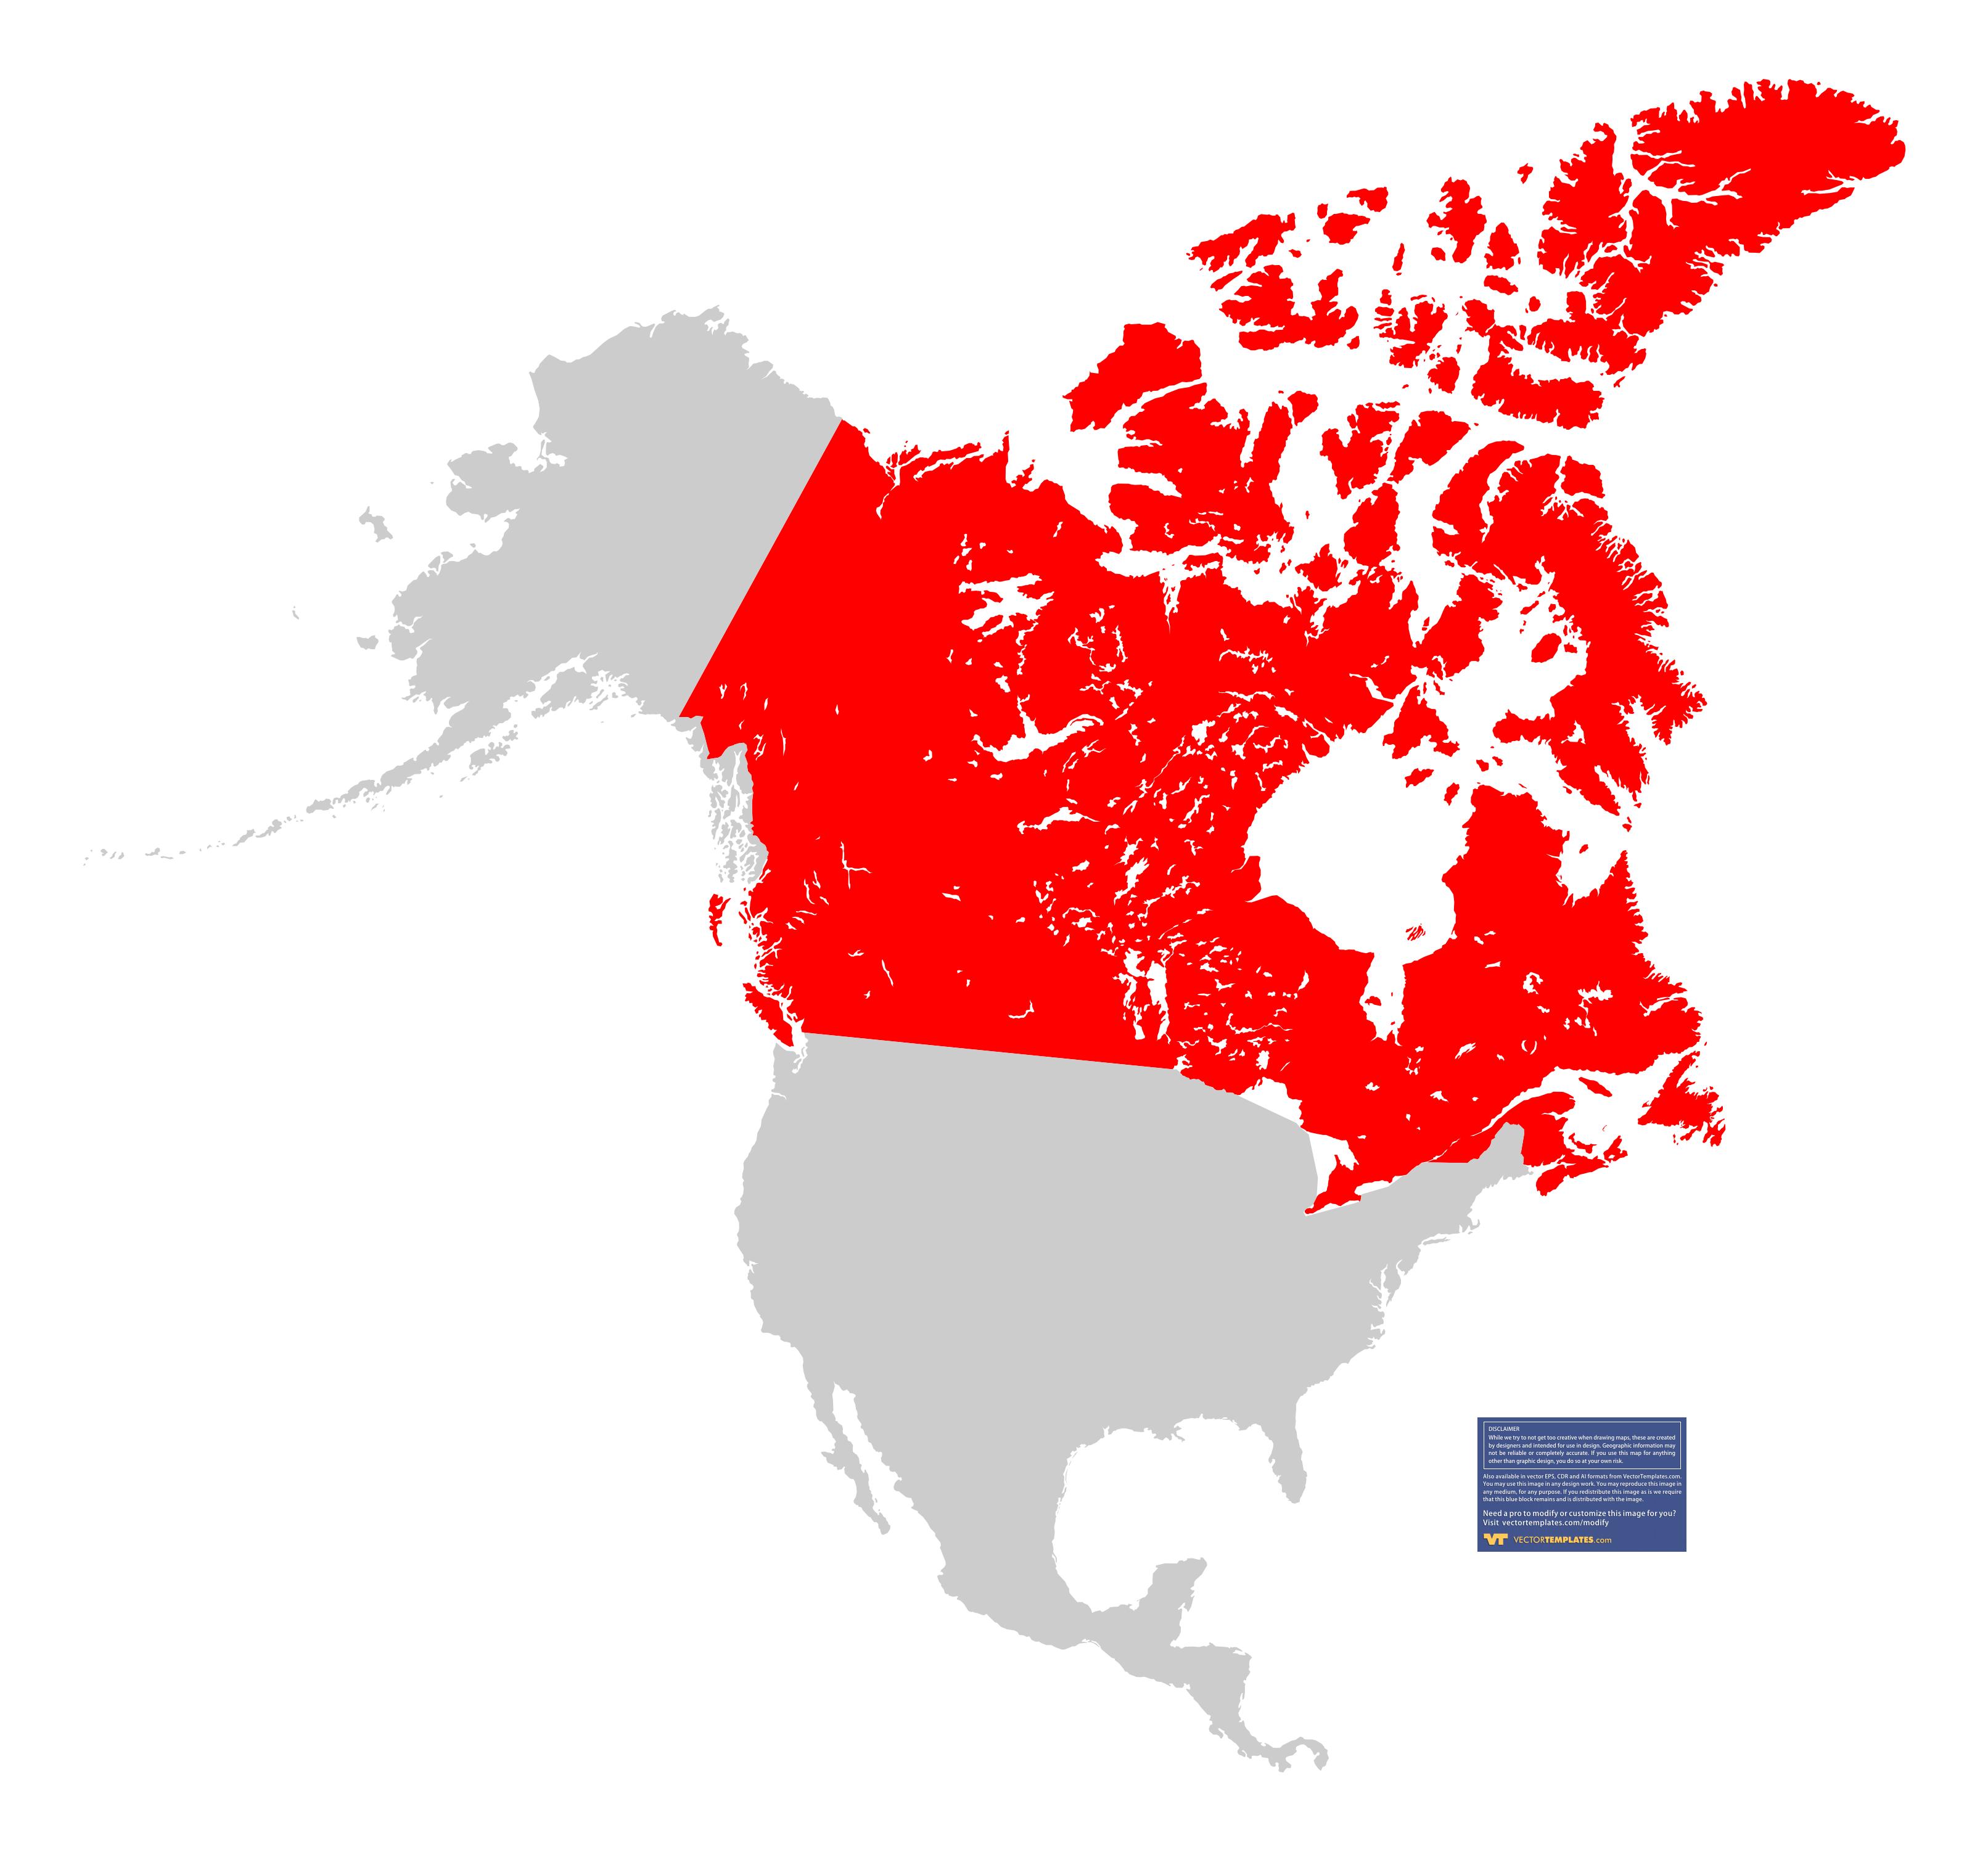 FileBlankMapUSAstatesCanadaprovinces HI Closersvg North America - United states map vector free ai